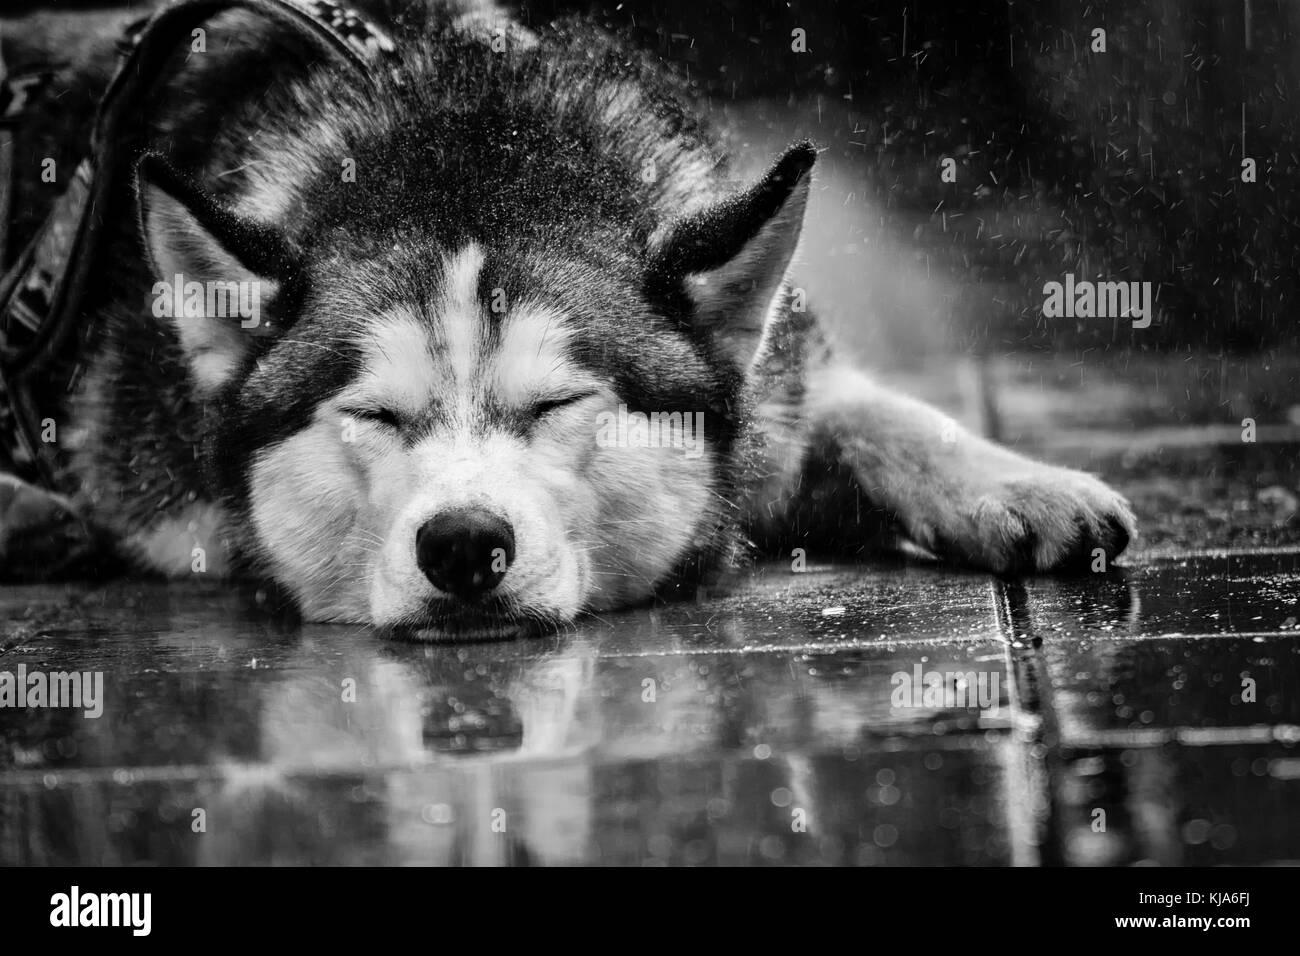 Husky in the rain - Stock Image